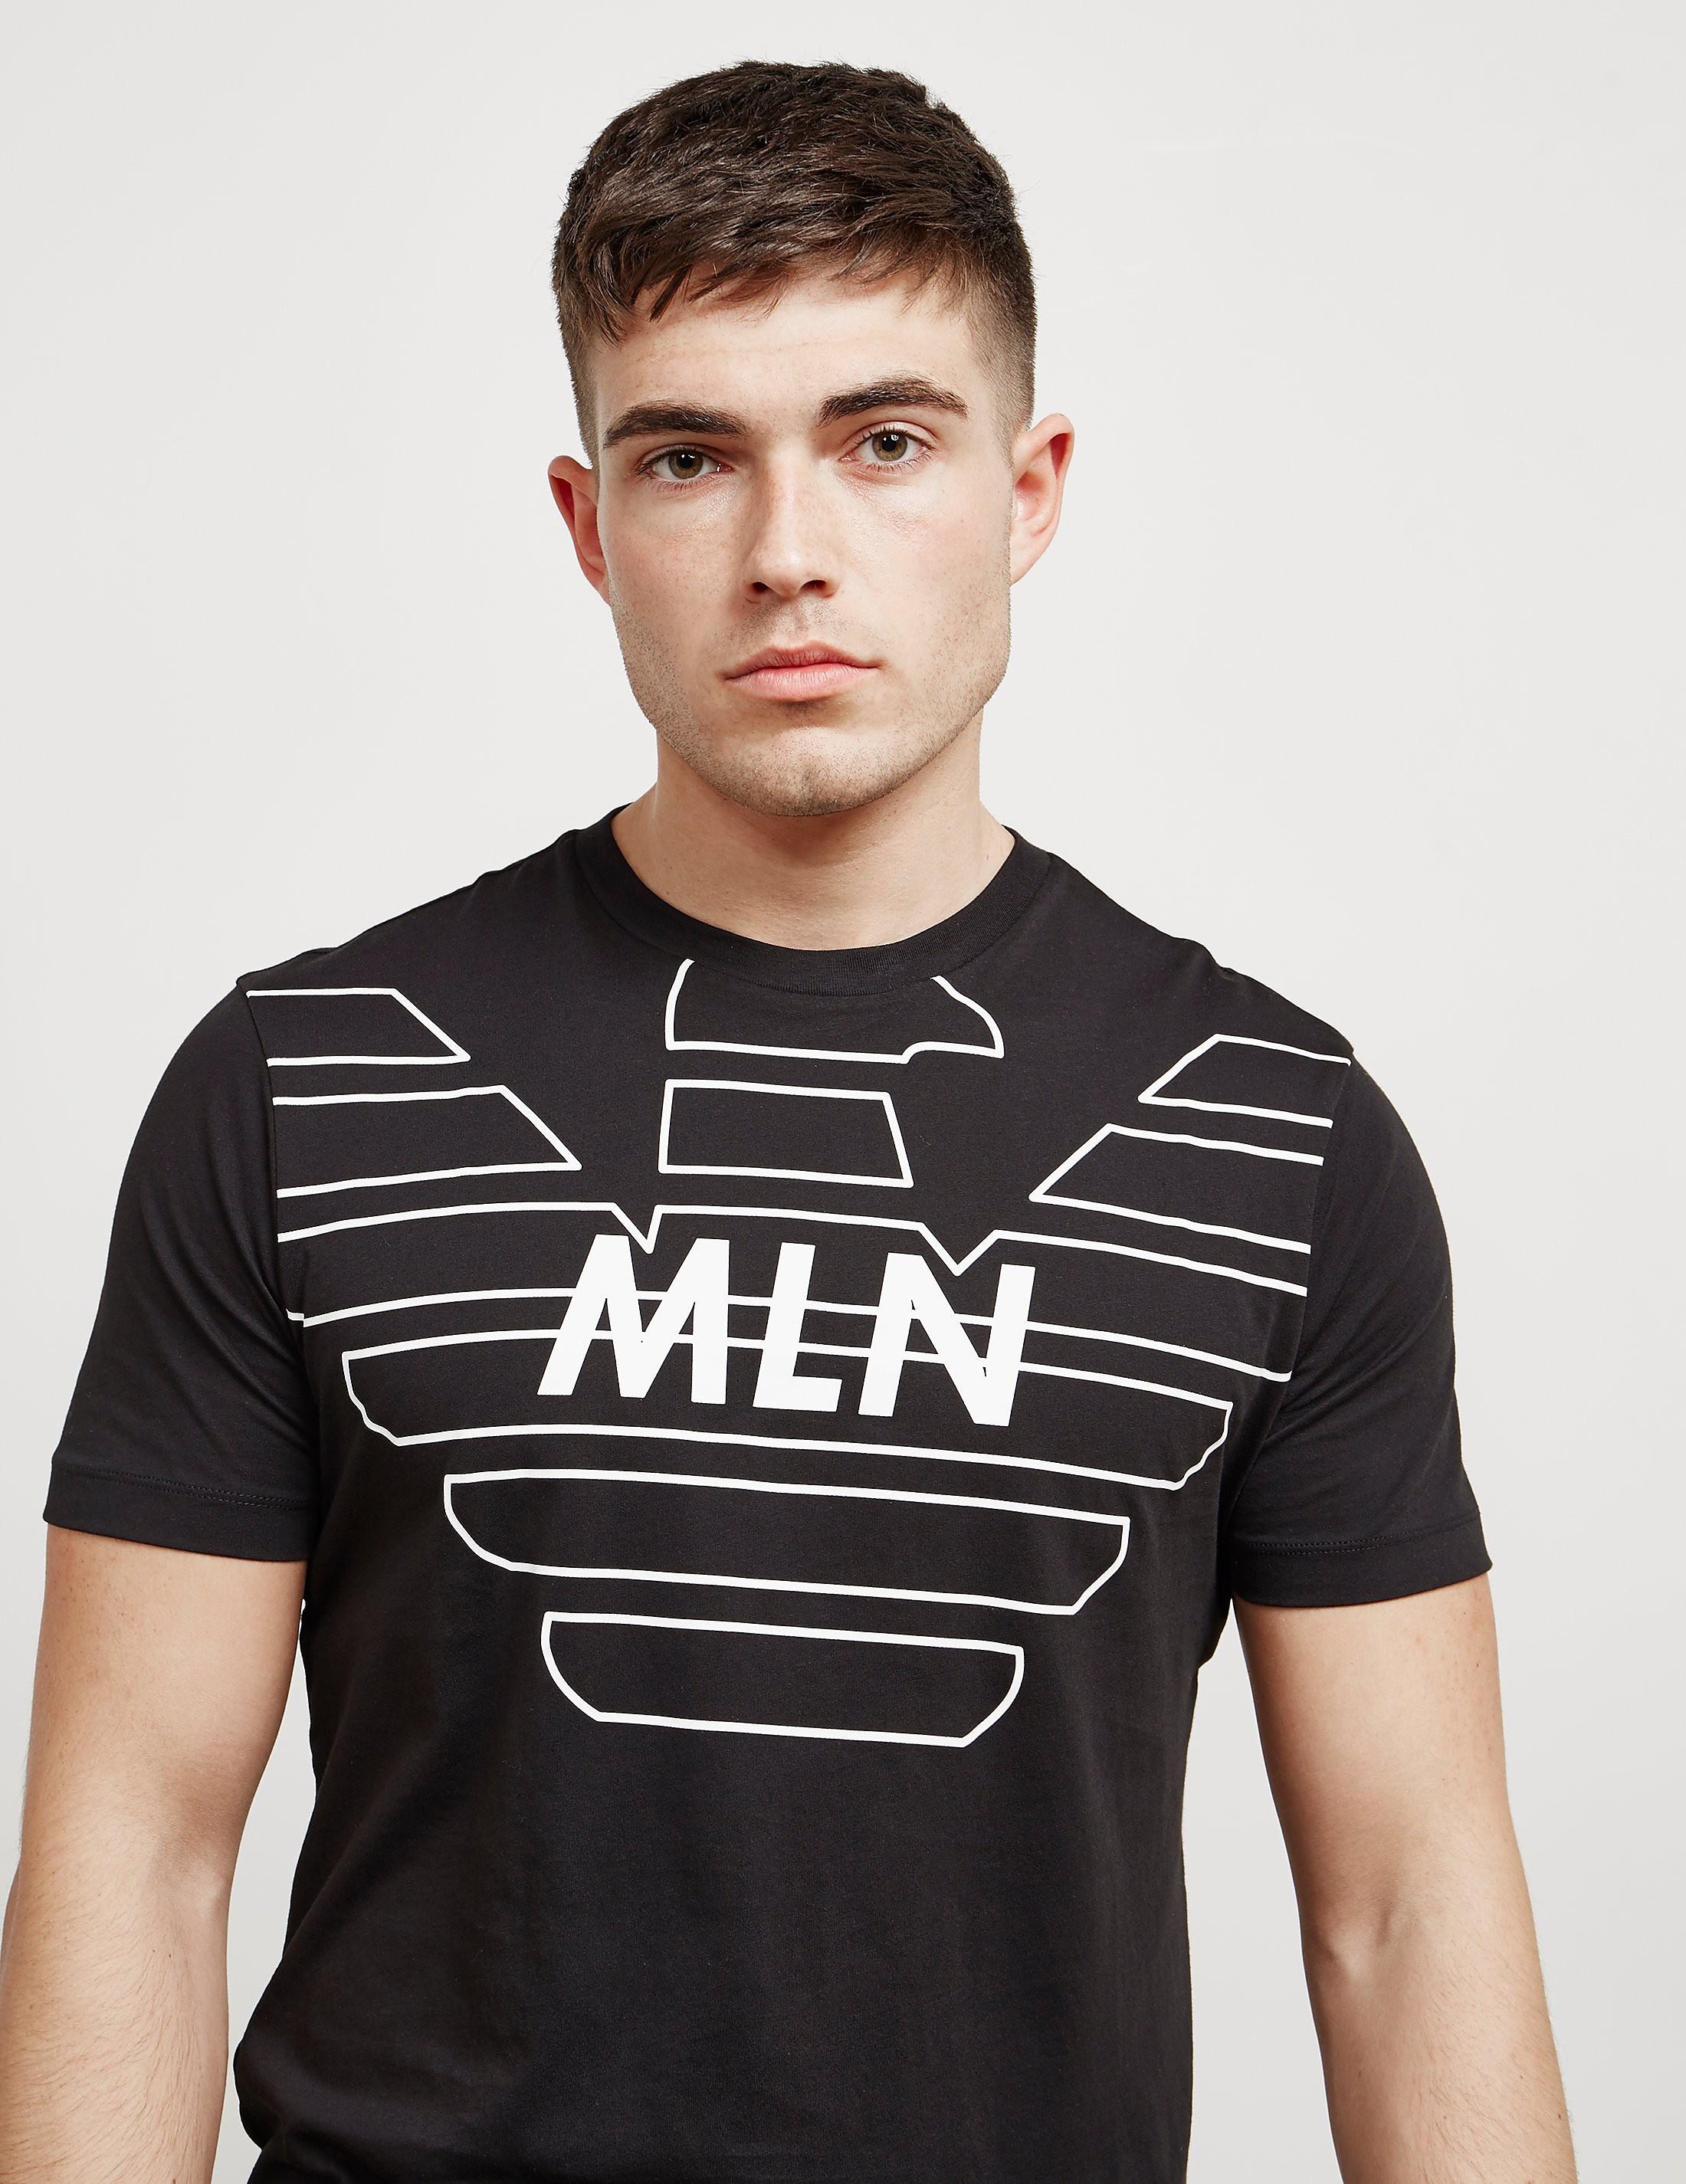 Emporio Armani MLN Eagle Short Sleeve T-Shirt